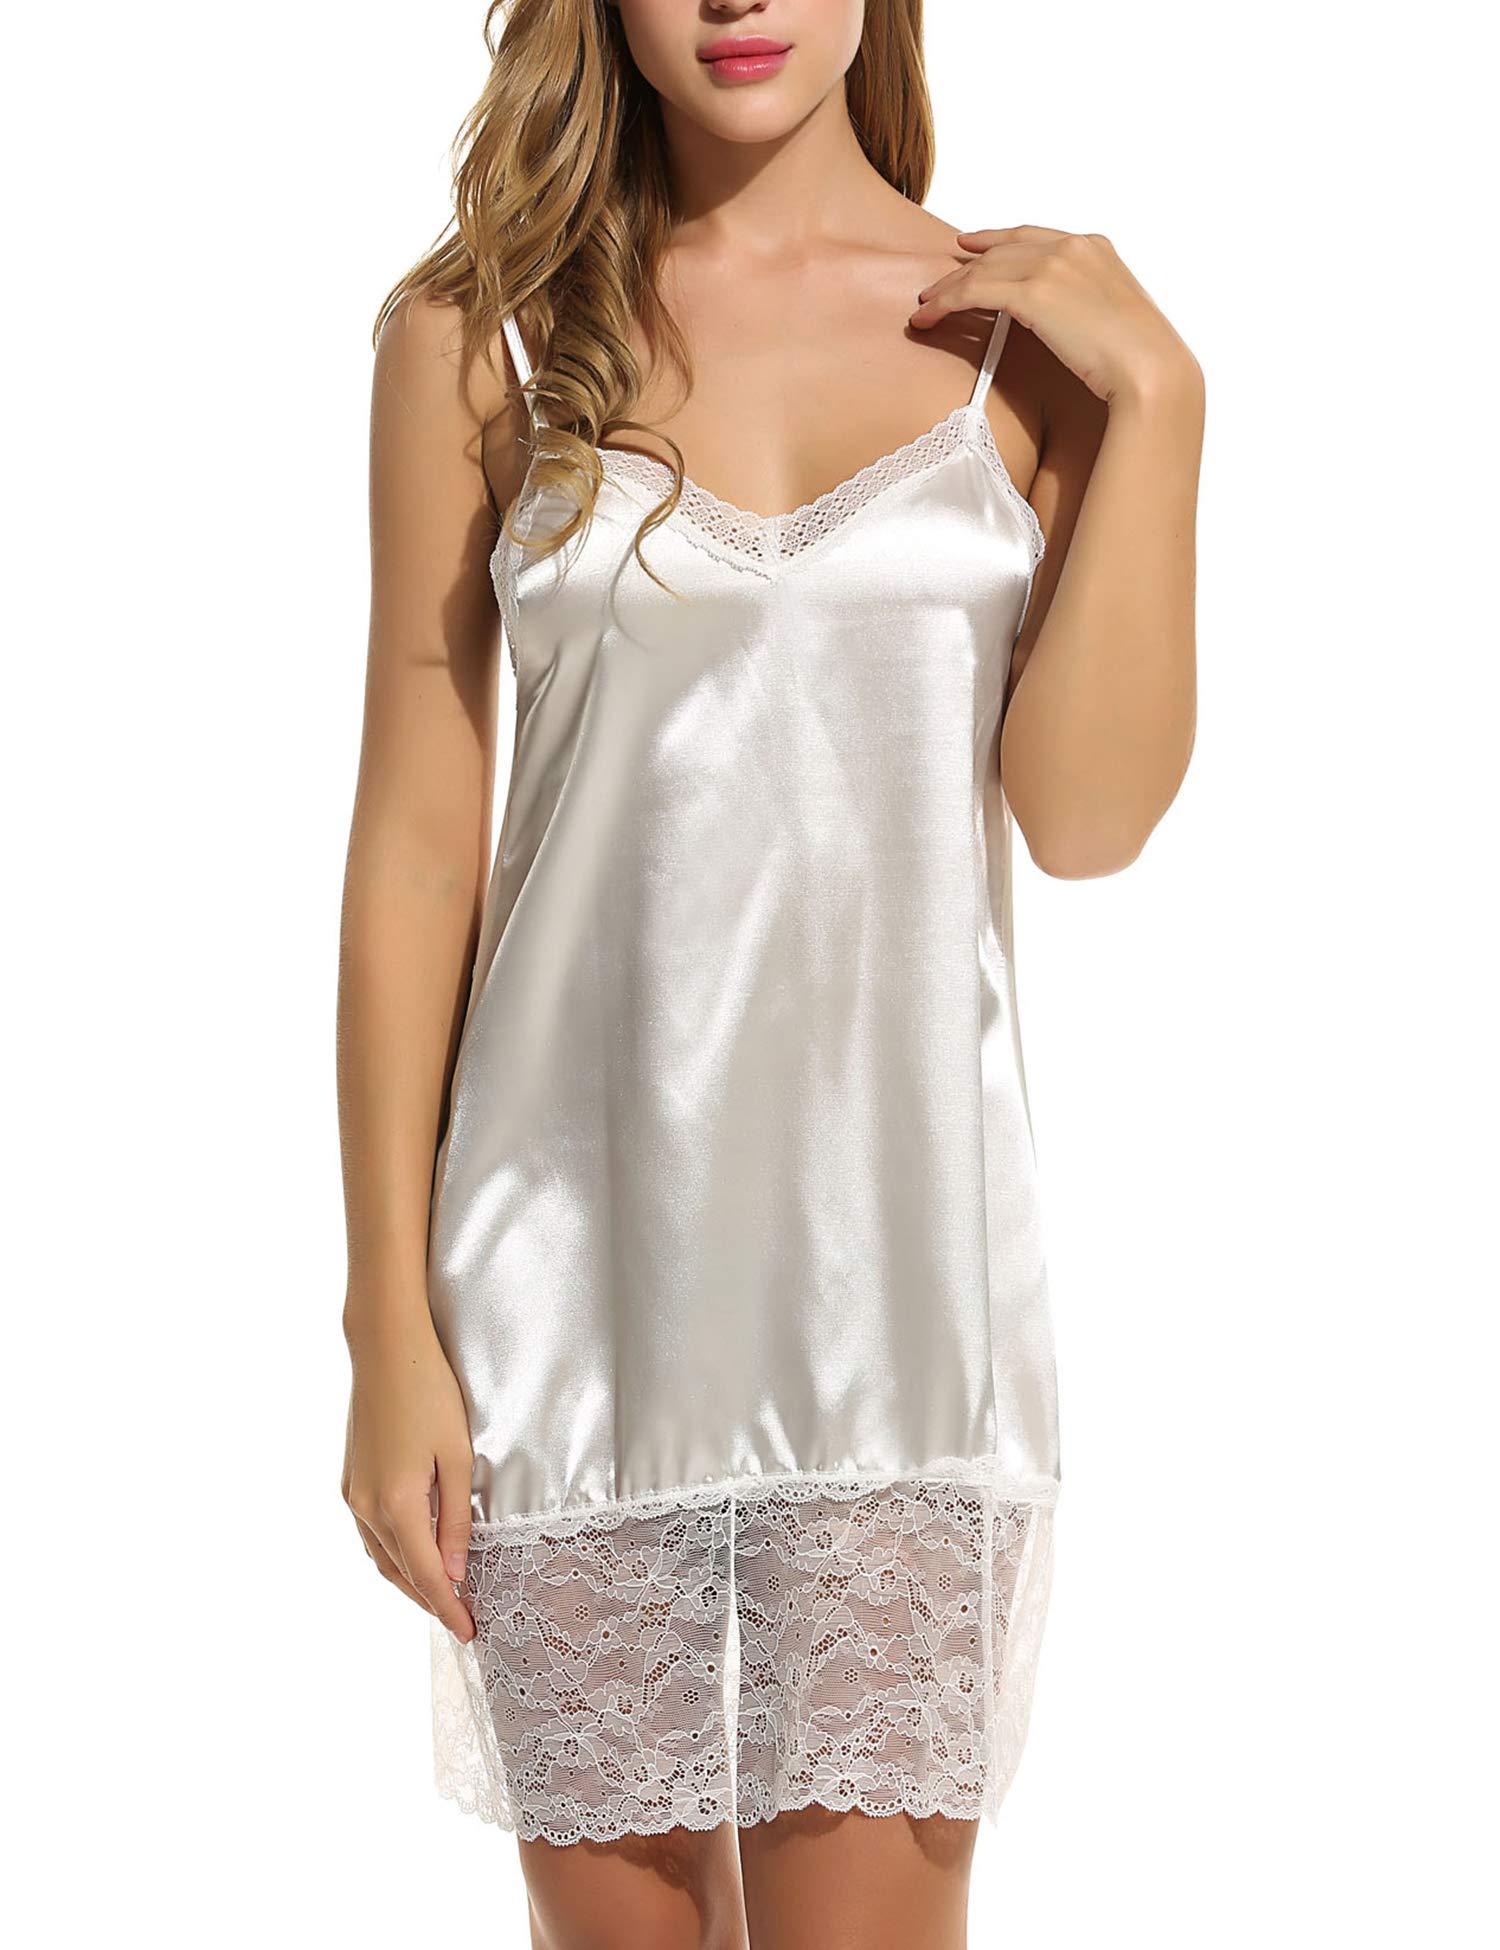 ELOVER Womens Satin Lingerie Sleepwear Lace Babydoll V Neck Chemise Nightgown White Medium